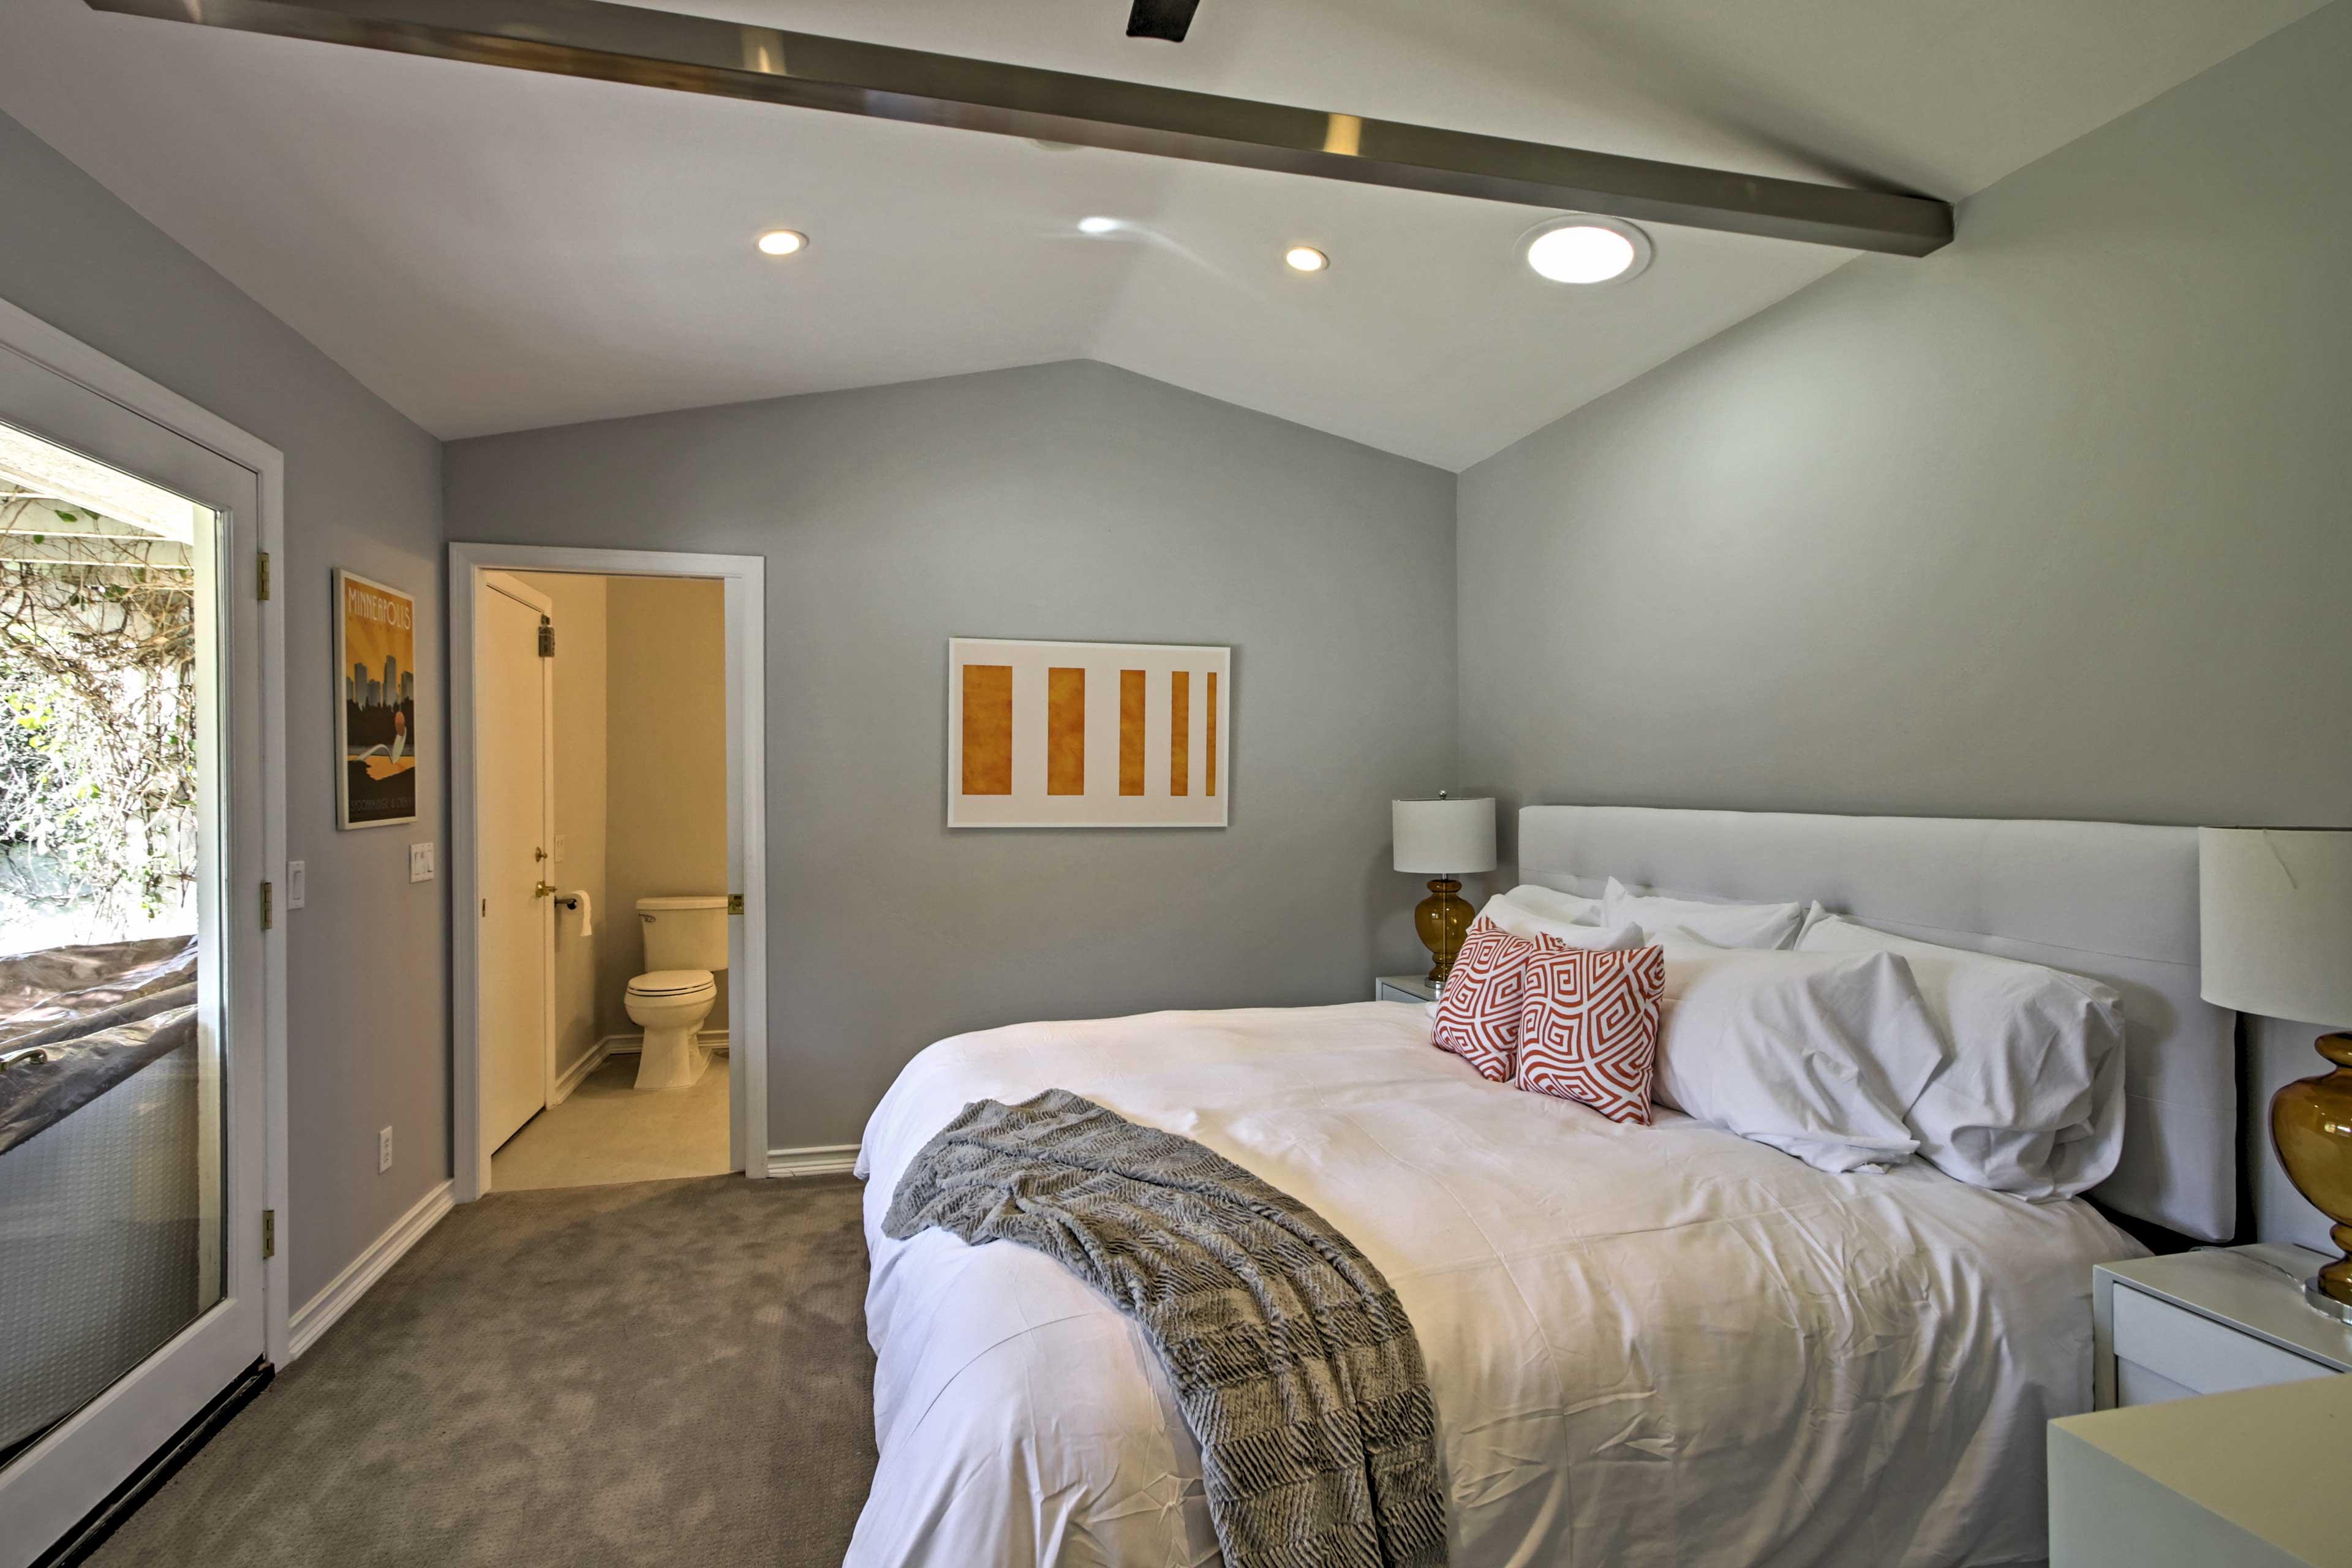 This bedroom has an en-suite bathroom and an exposed wood beam inside.